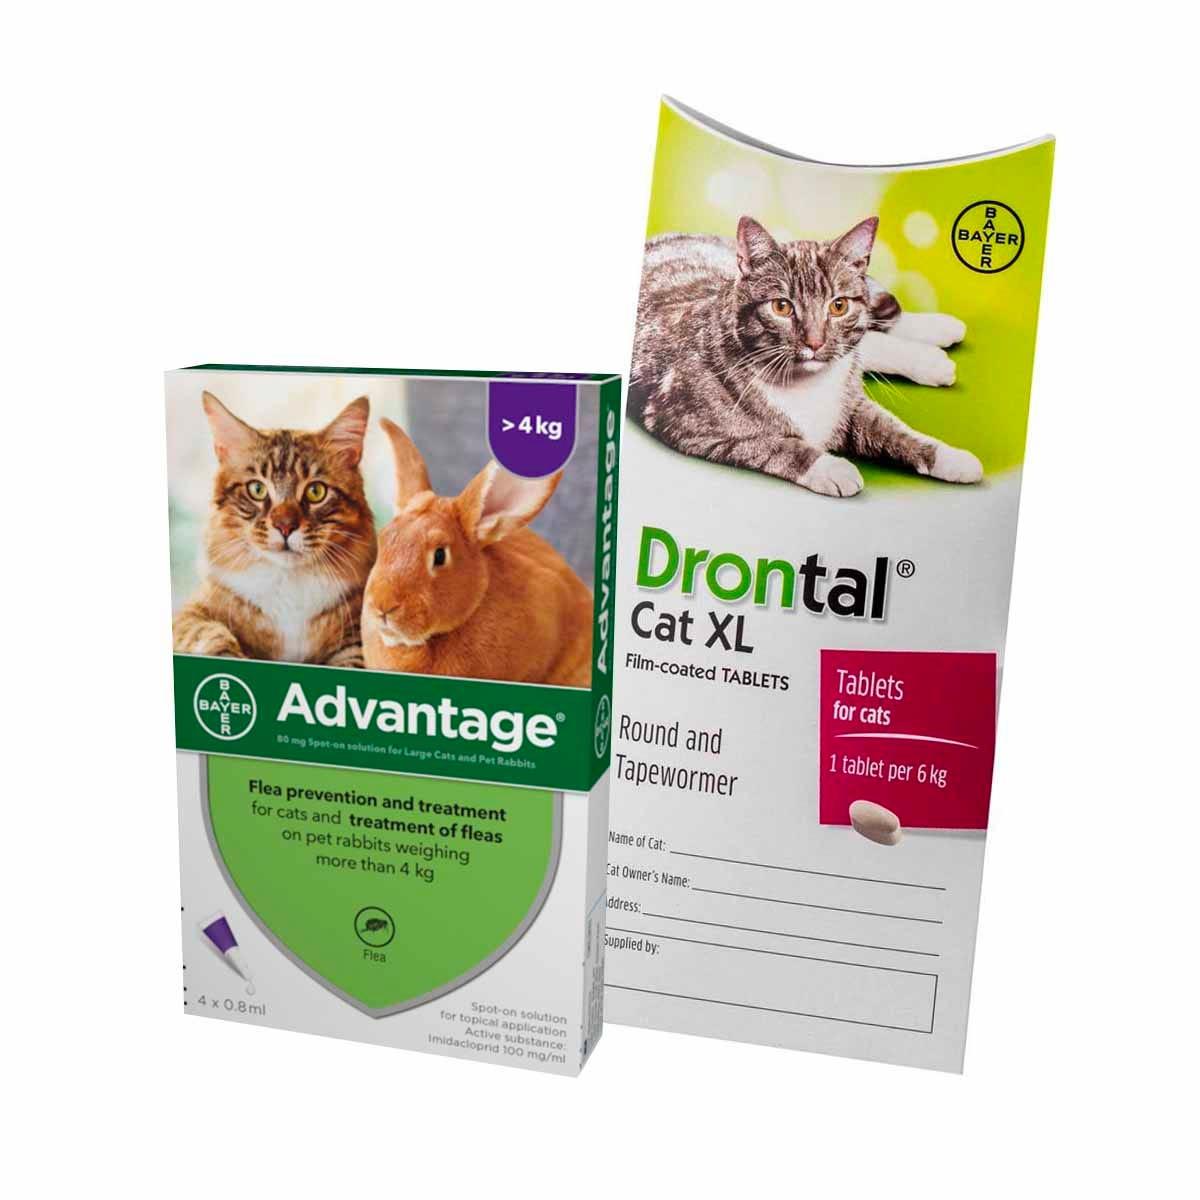 12 Month Flea & Worm Treatment For Cats – Advantage & Drontal